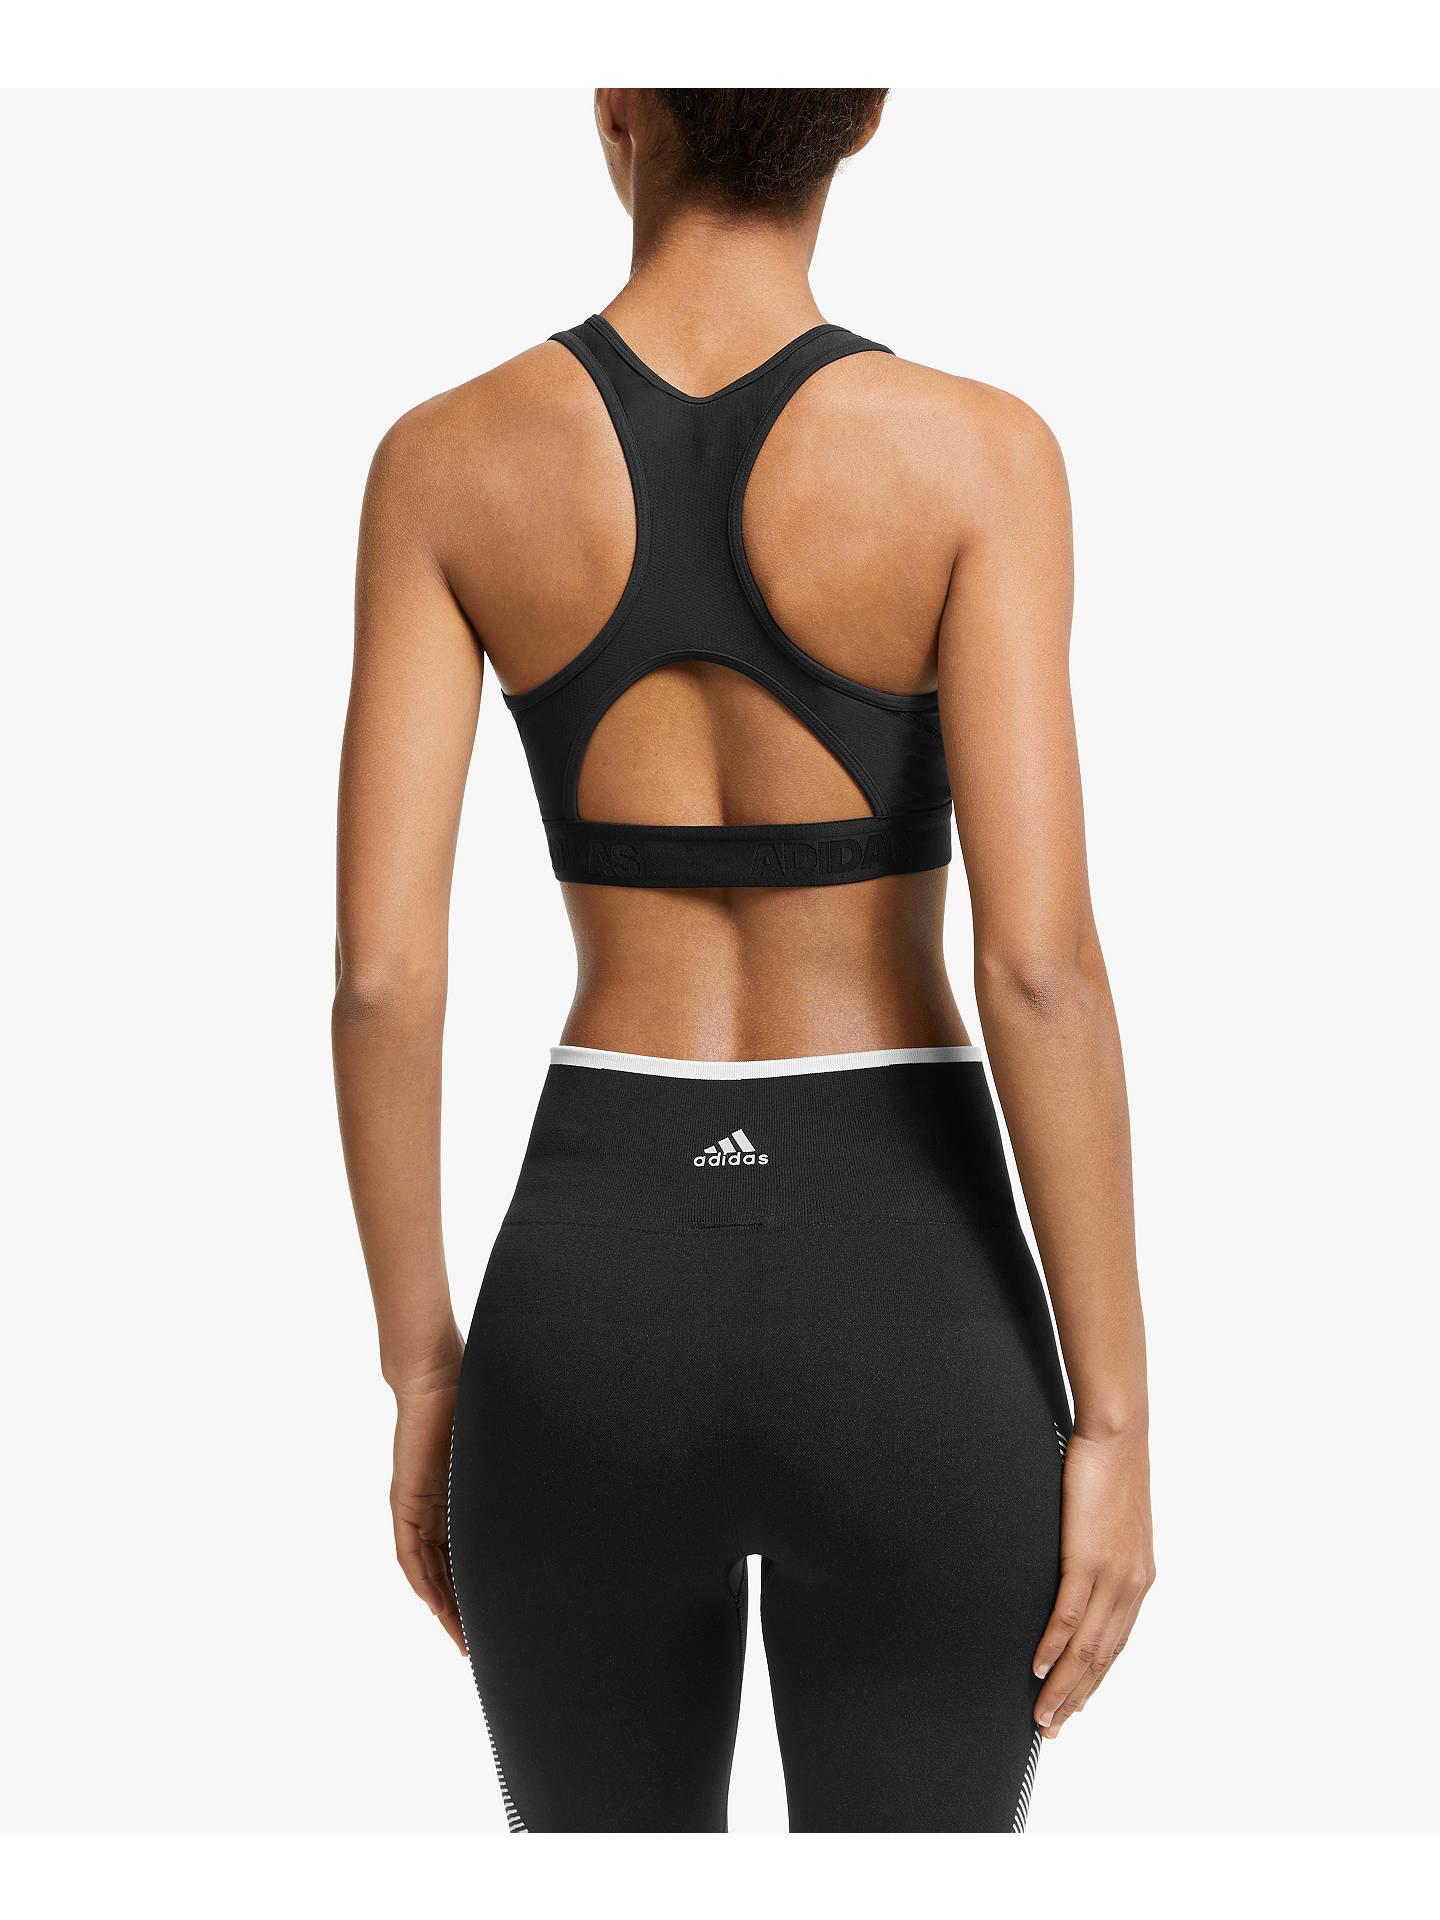 242ee444dbf adidas Don't Rest Alpha Skin Sports Bra, Black